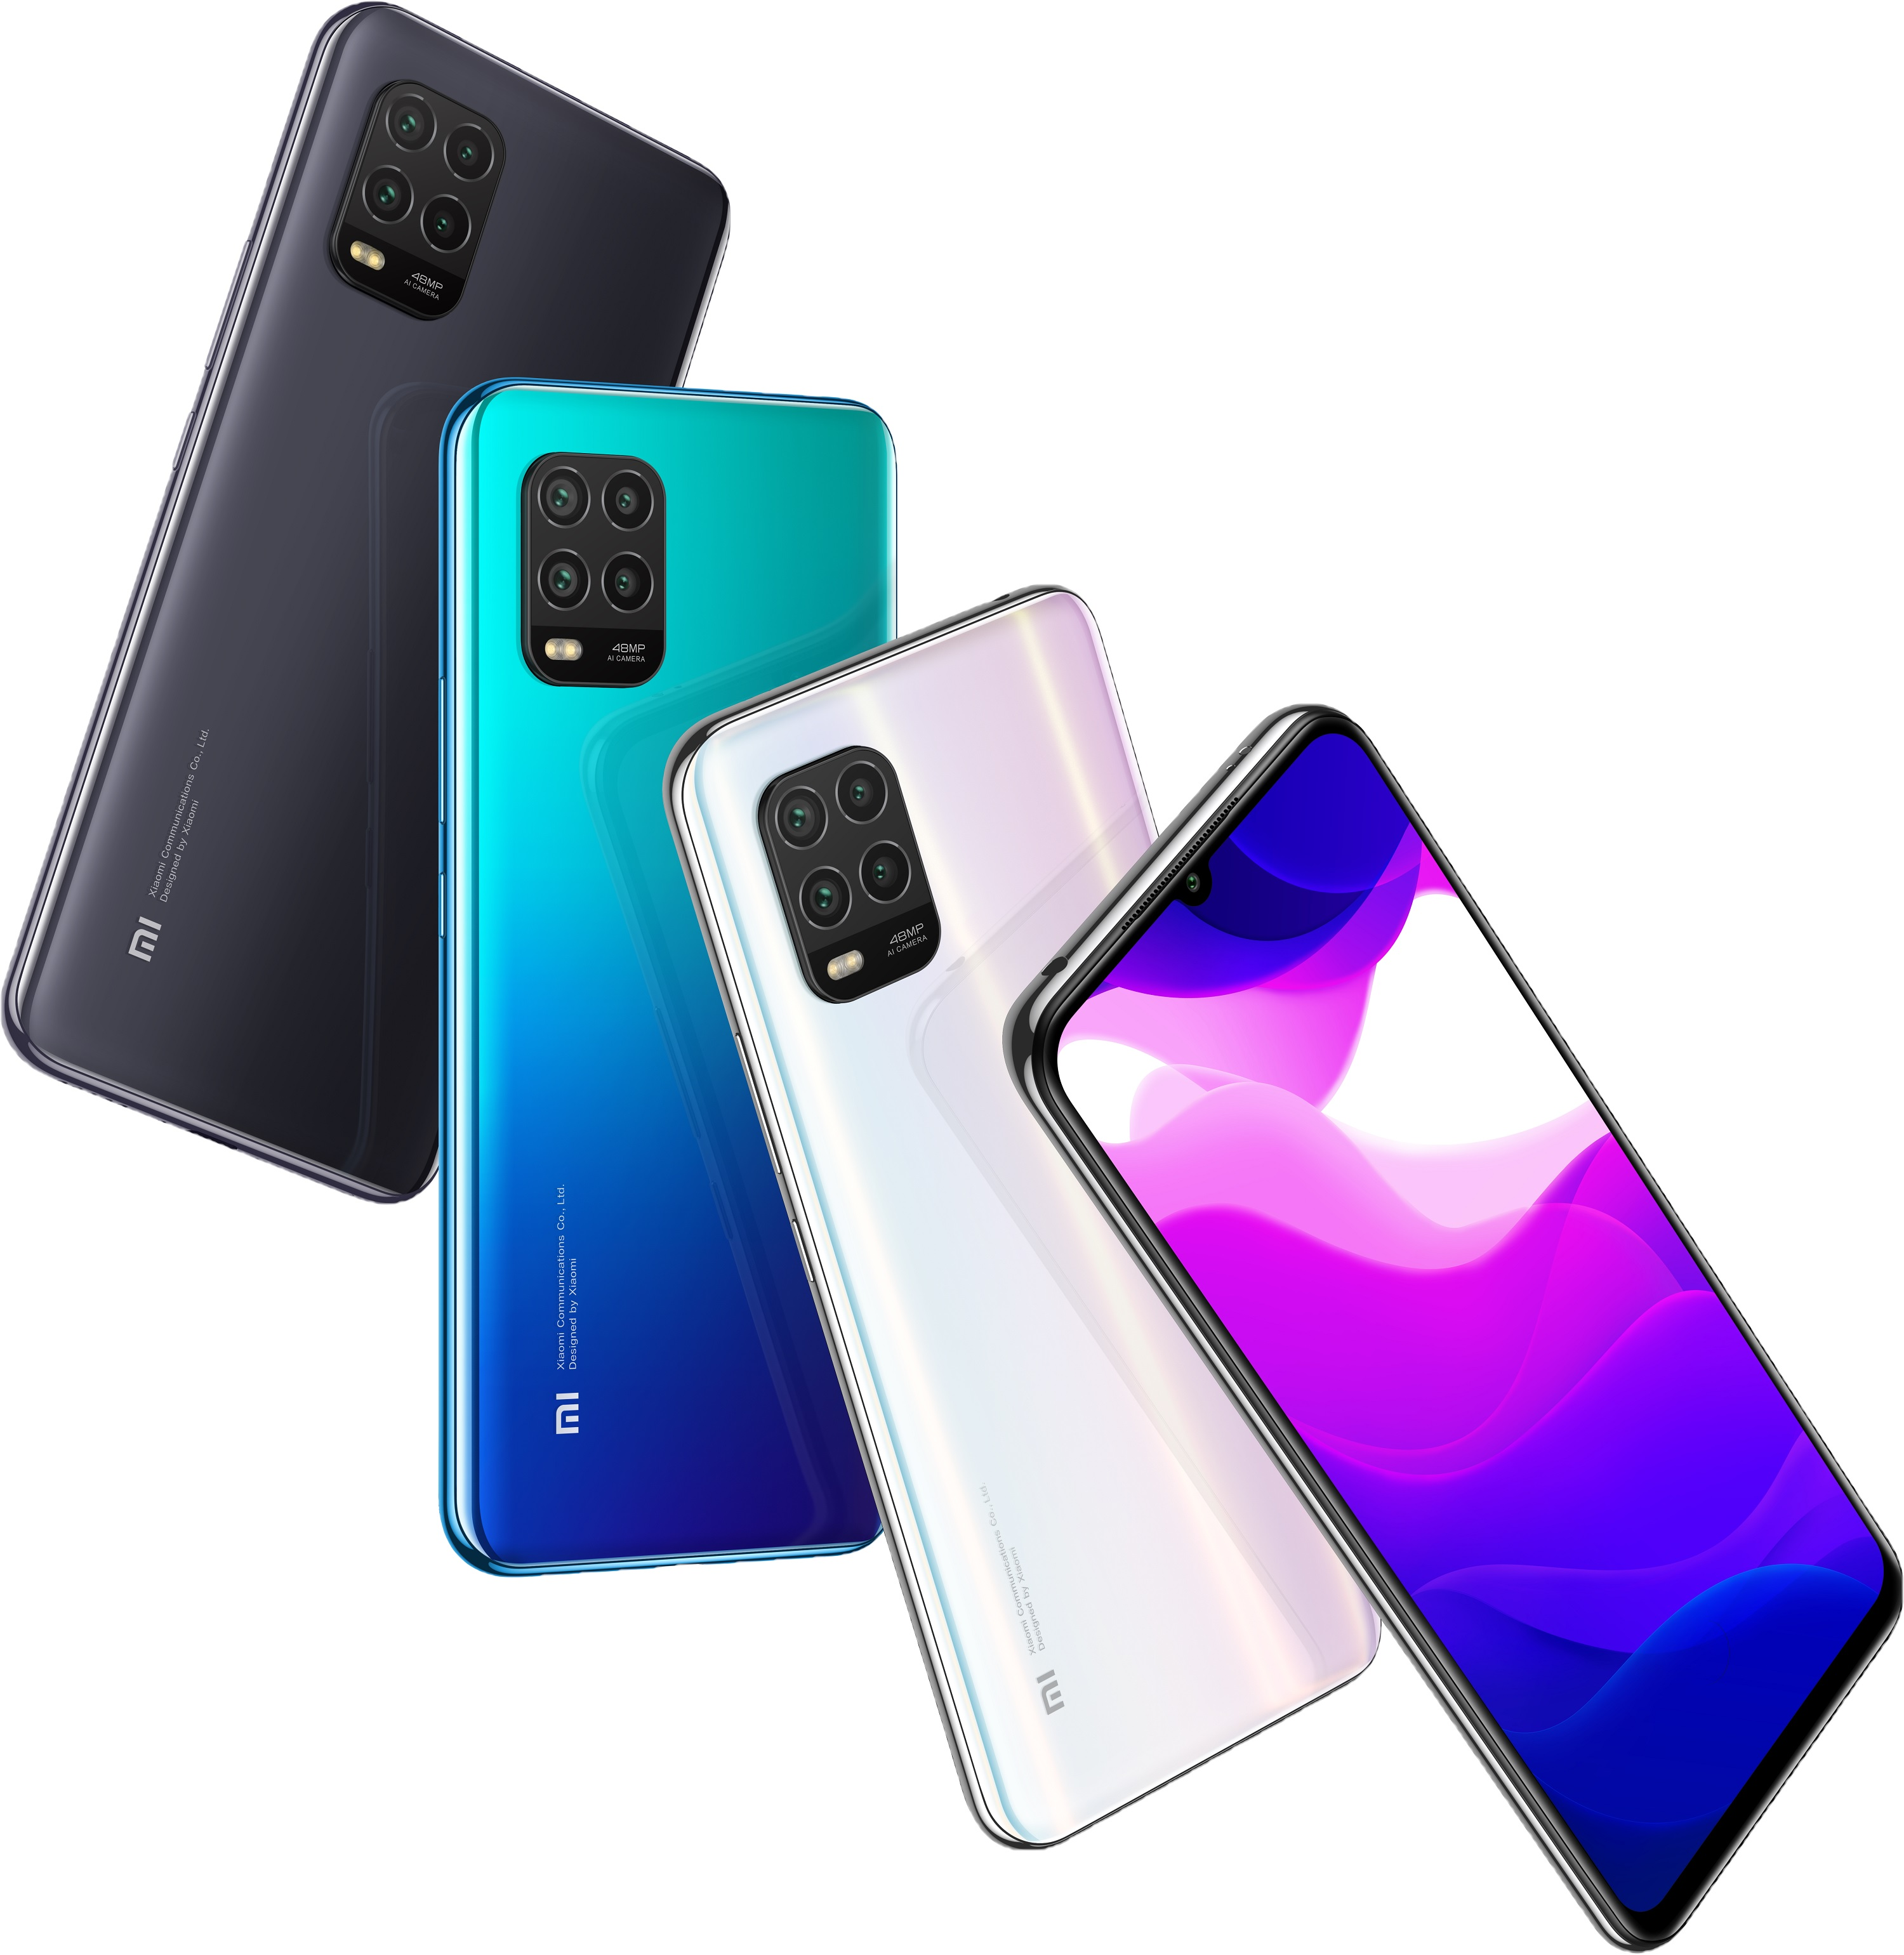 Xiaomin edullinen 5g puhelin mi 10 lite